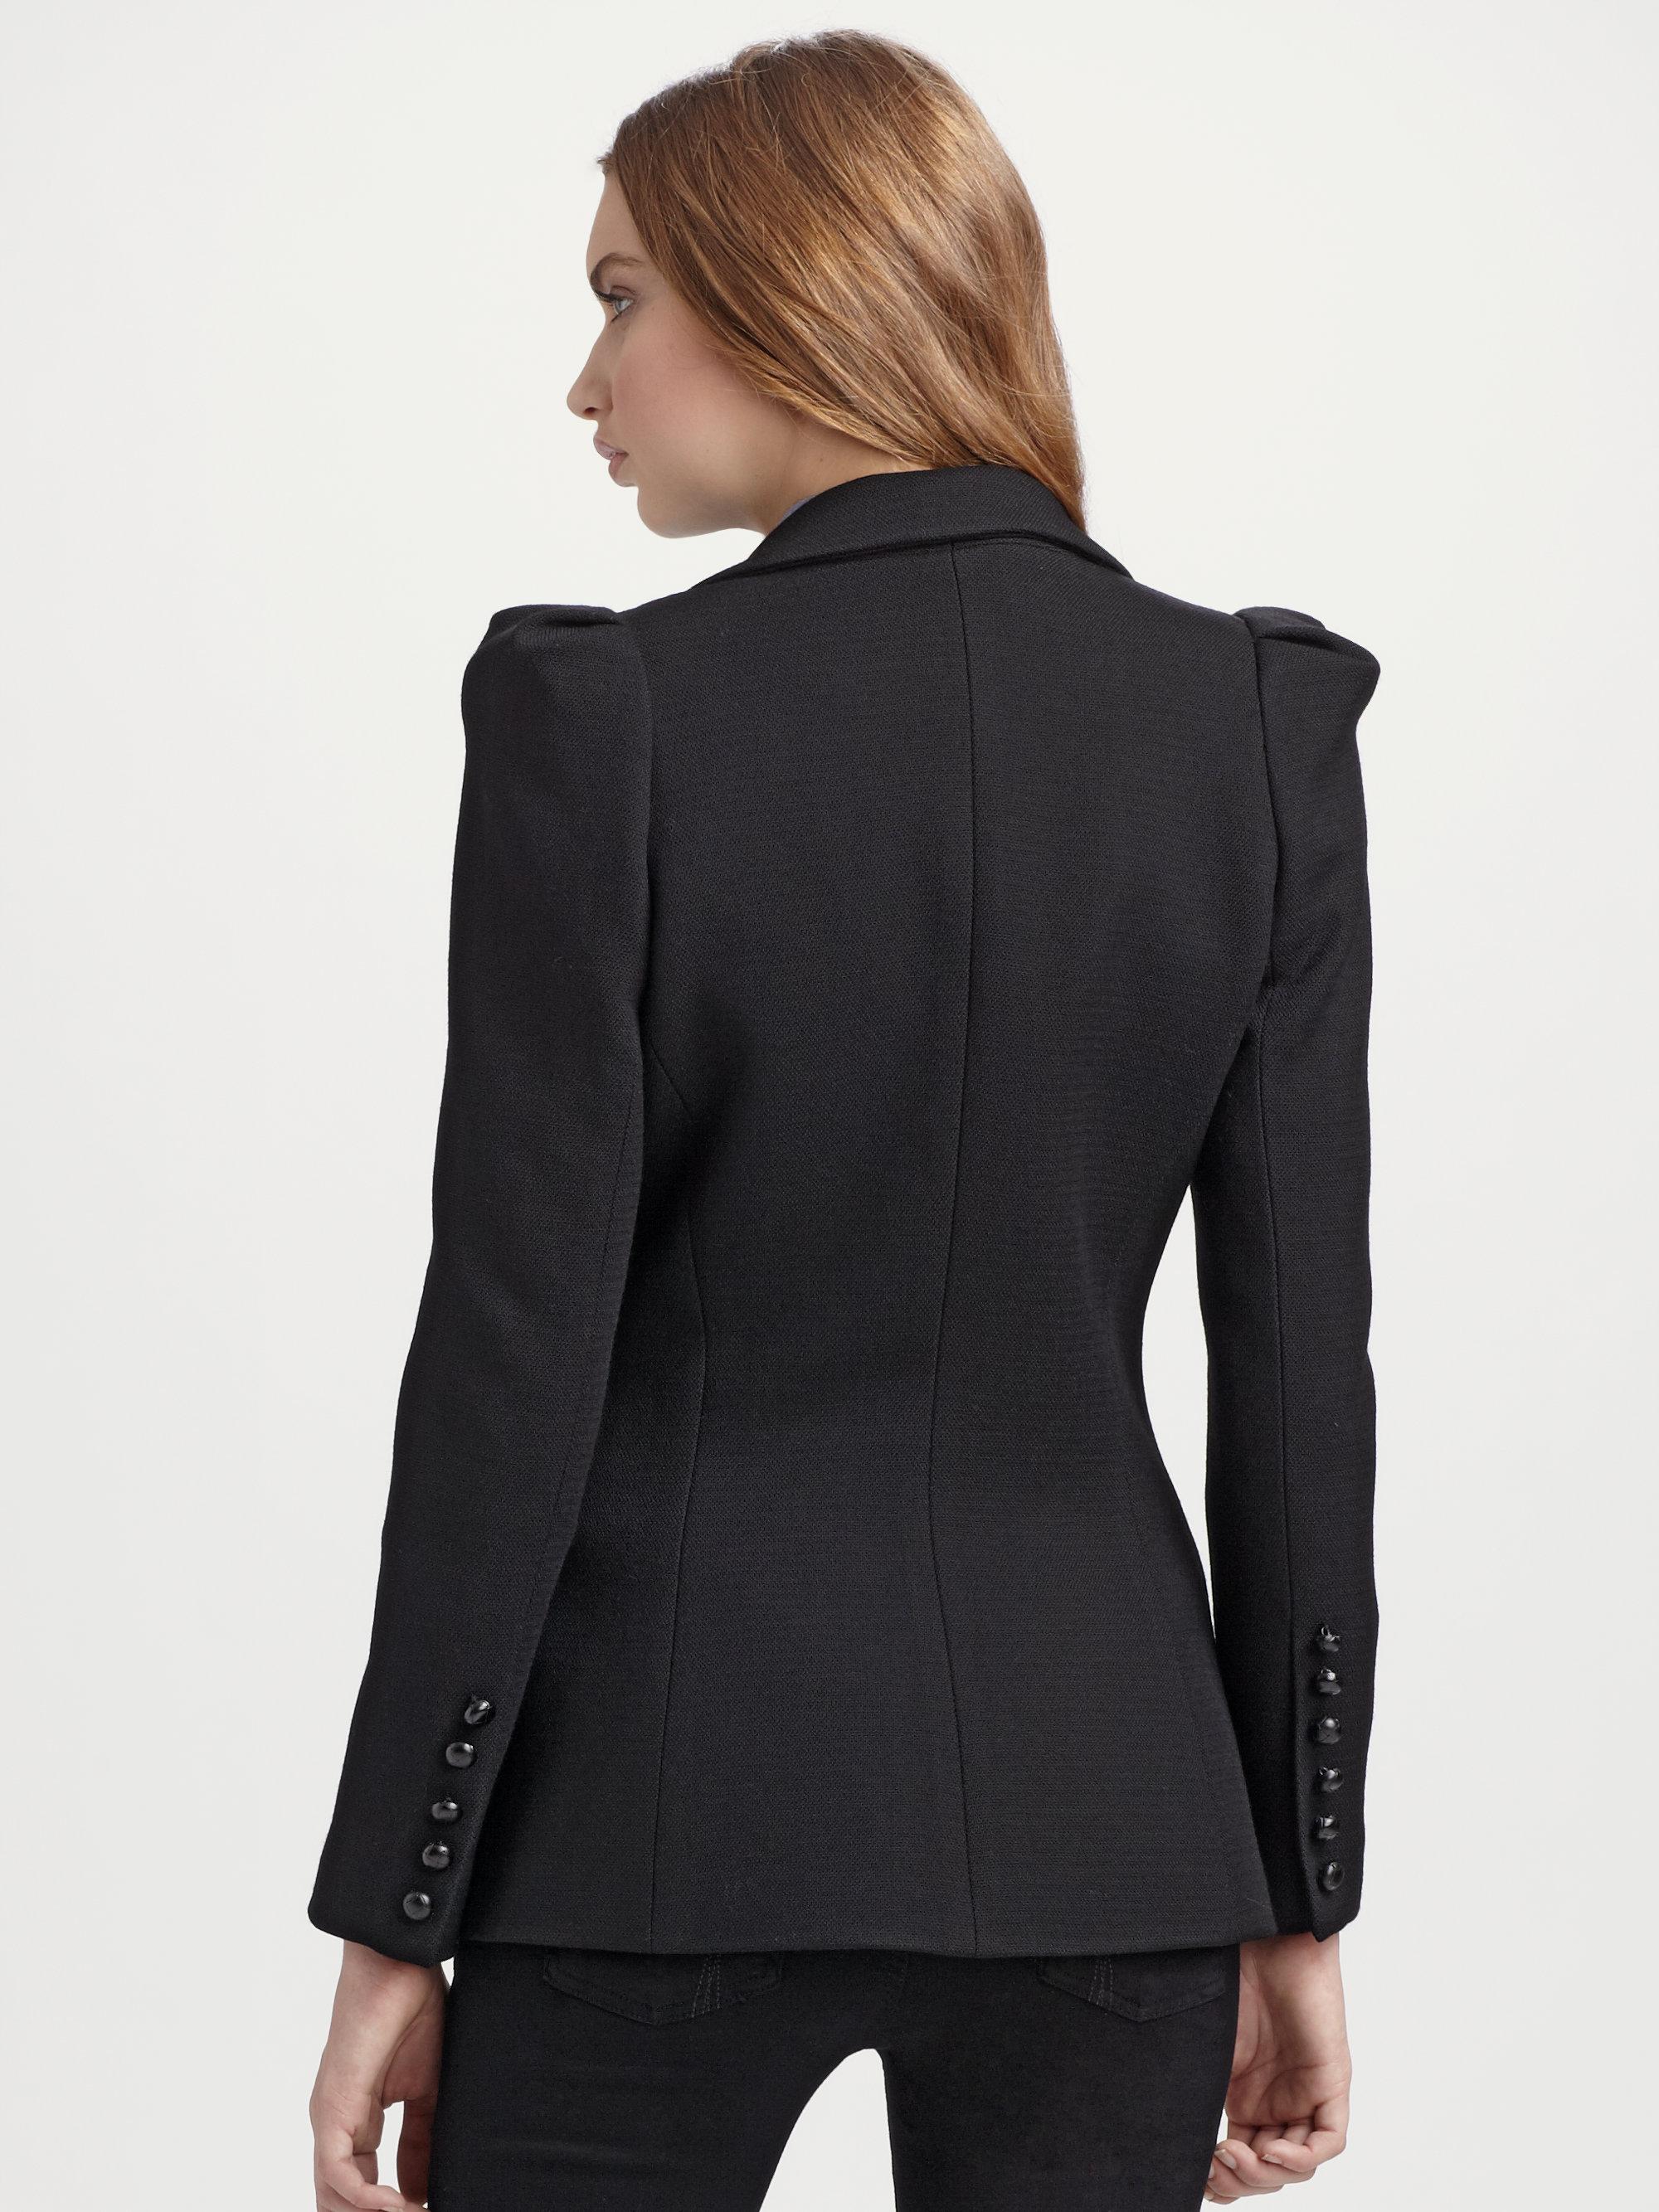 Smythe box pleat blazer in black lyst for Smythe inc